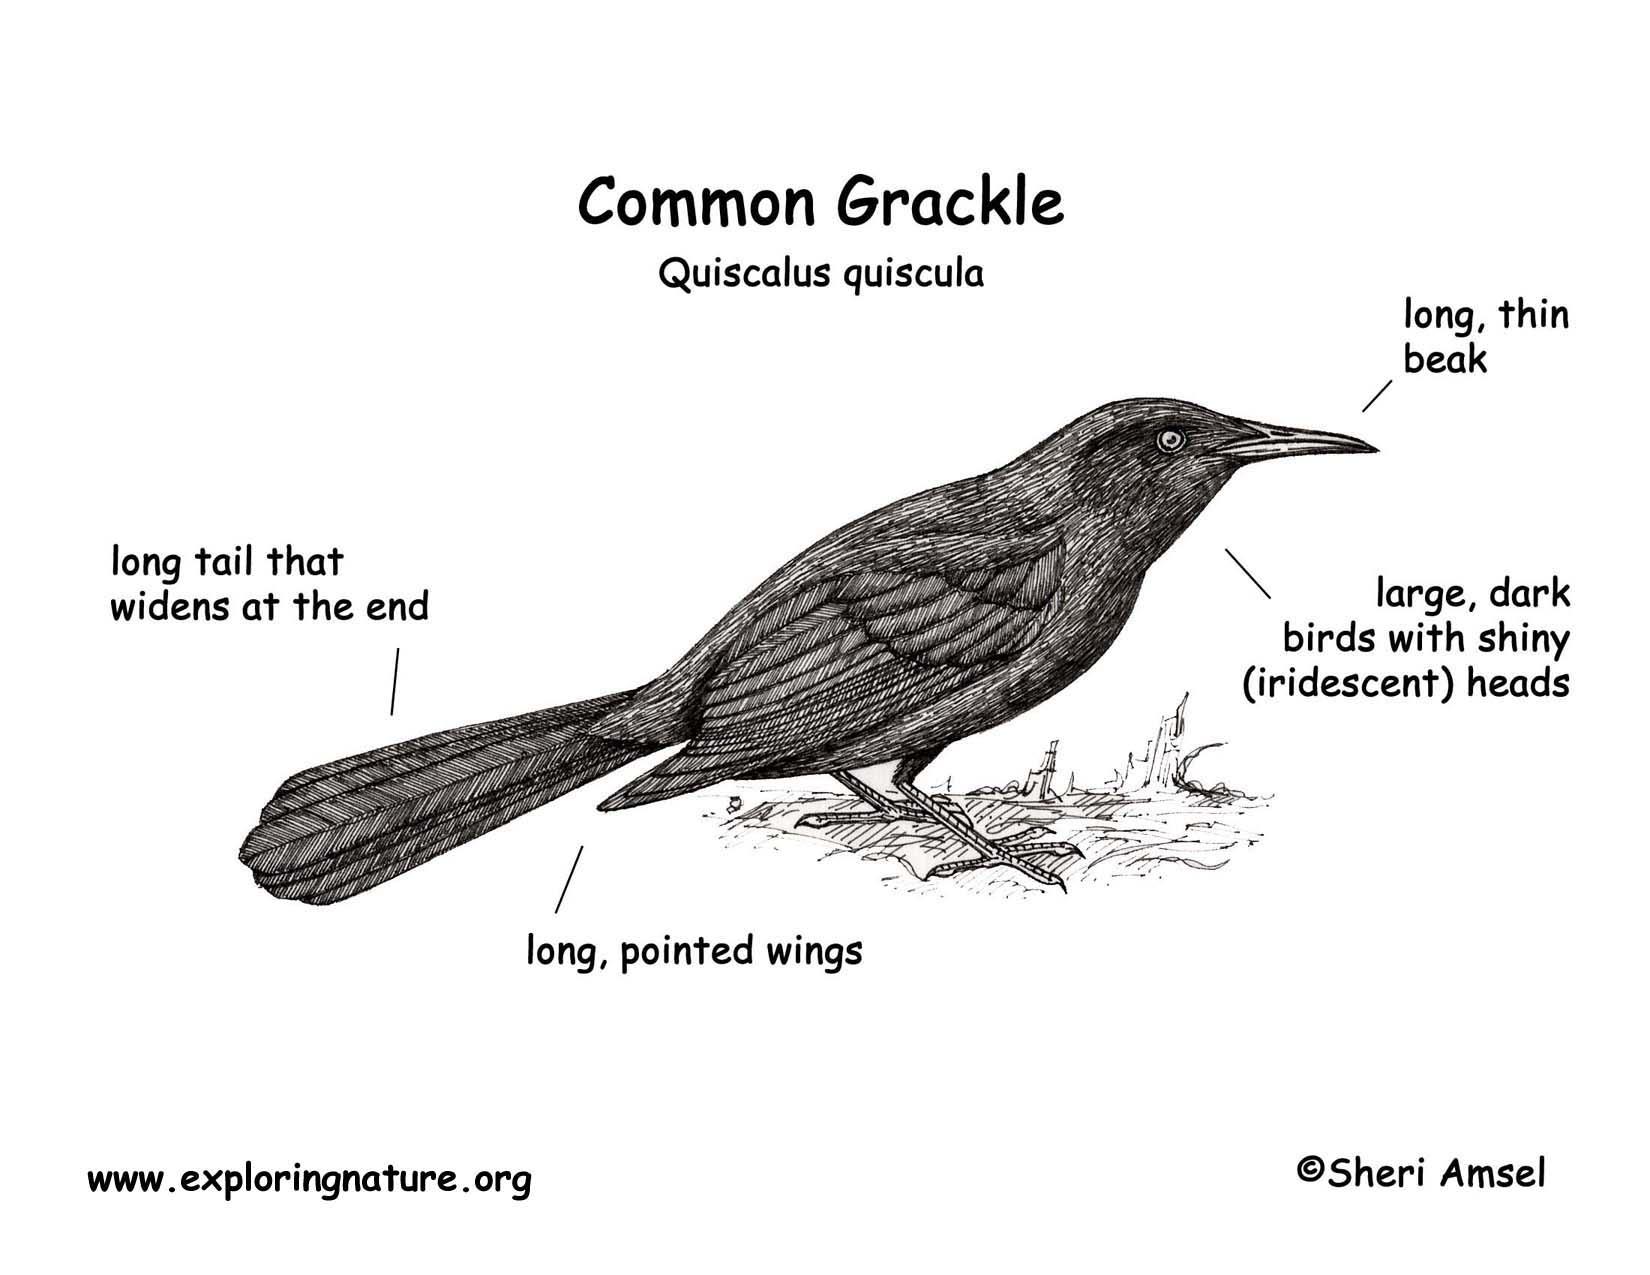 Grackle Common